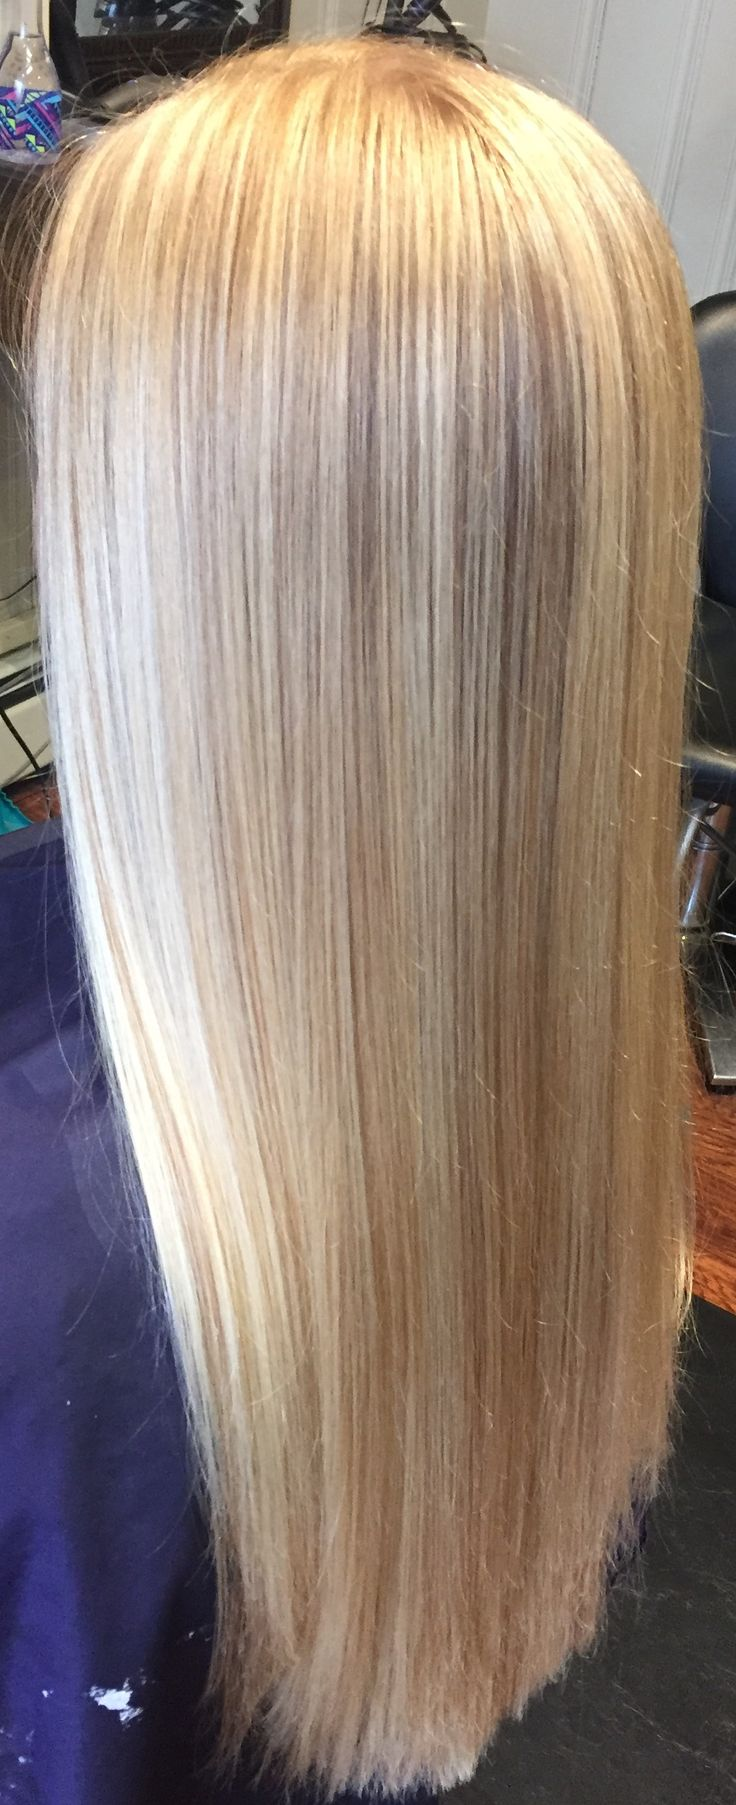 Best 25 blonde dimensional hair ideas on pinterest ashy blonde light blonde highlights on natural strawberry blonde hair pmusecretfo Gallery